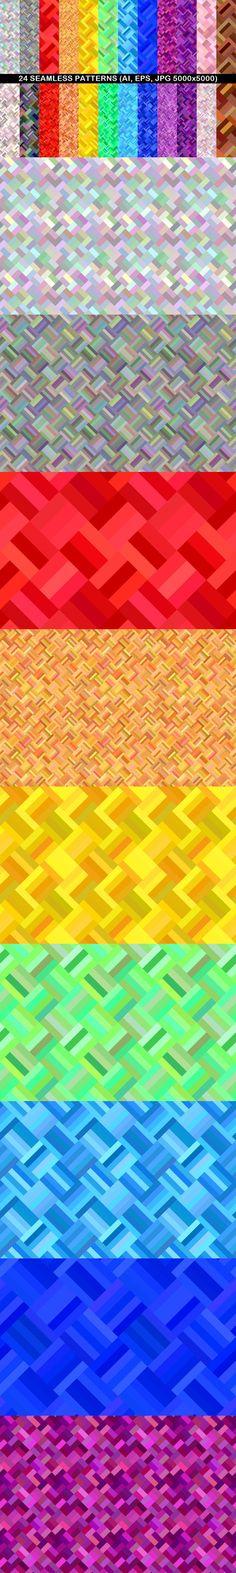 24 Seamless Patterns #seamlesspattern #SeamlessPattern #BackgroundSets #GeometricalPattern #DavidZydd #patterns #GeometricDesign #RepeatingPatterns #seamlesssquarepattern #discount #BackgroundGraphics #CheapVectorBackground #BackgroundCollection #CheapBackground #CheapVectorBackgrounds #pattern #CheapVectorGraphics #PatternSets #PatternCollections Geometric Background, Vector Background, Background Patterns, Vector Pattern, Pattern Design, Pattern And Decoration, Repeating Patterns, Line Design, Vector Graphics